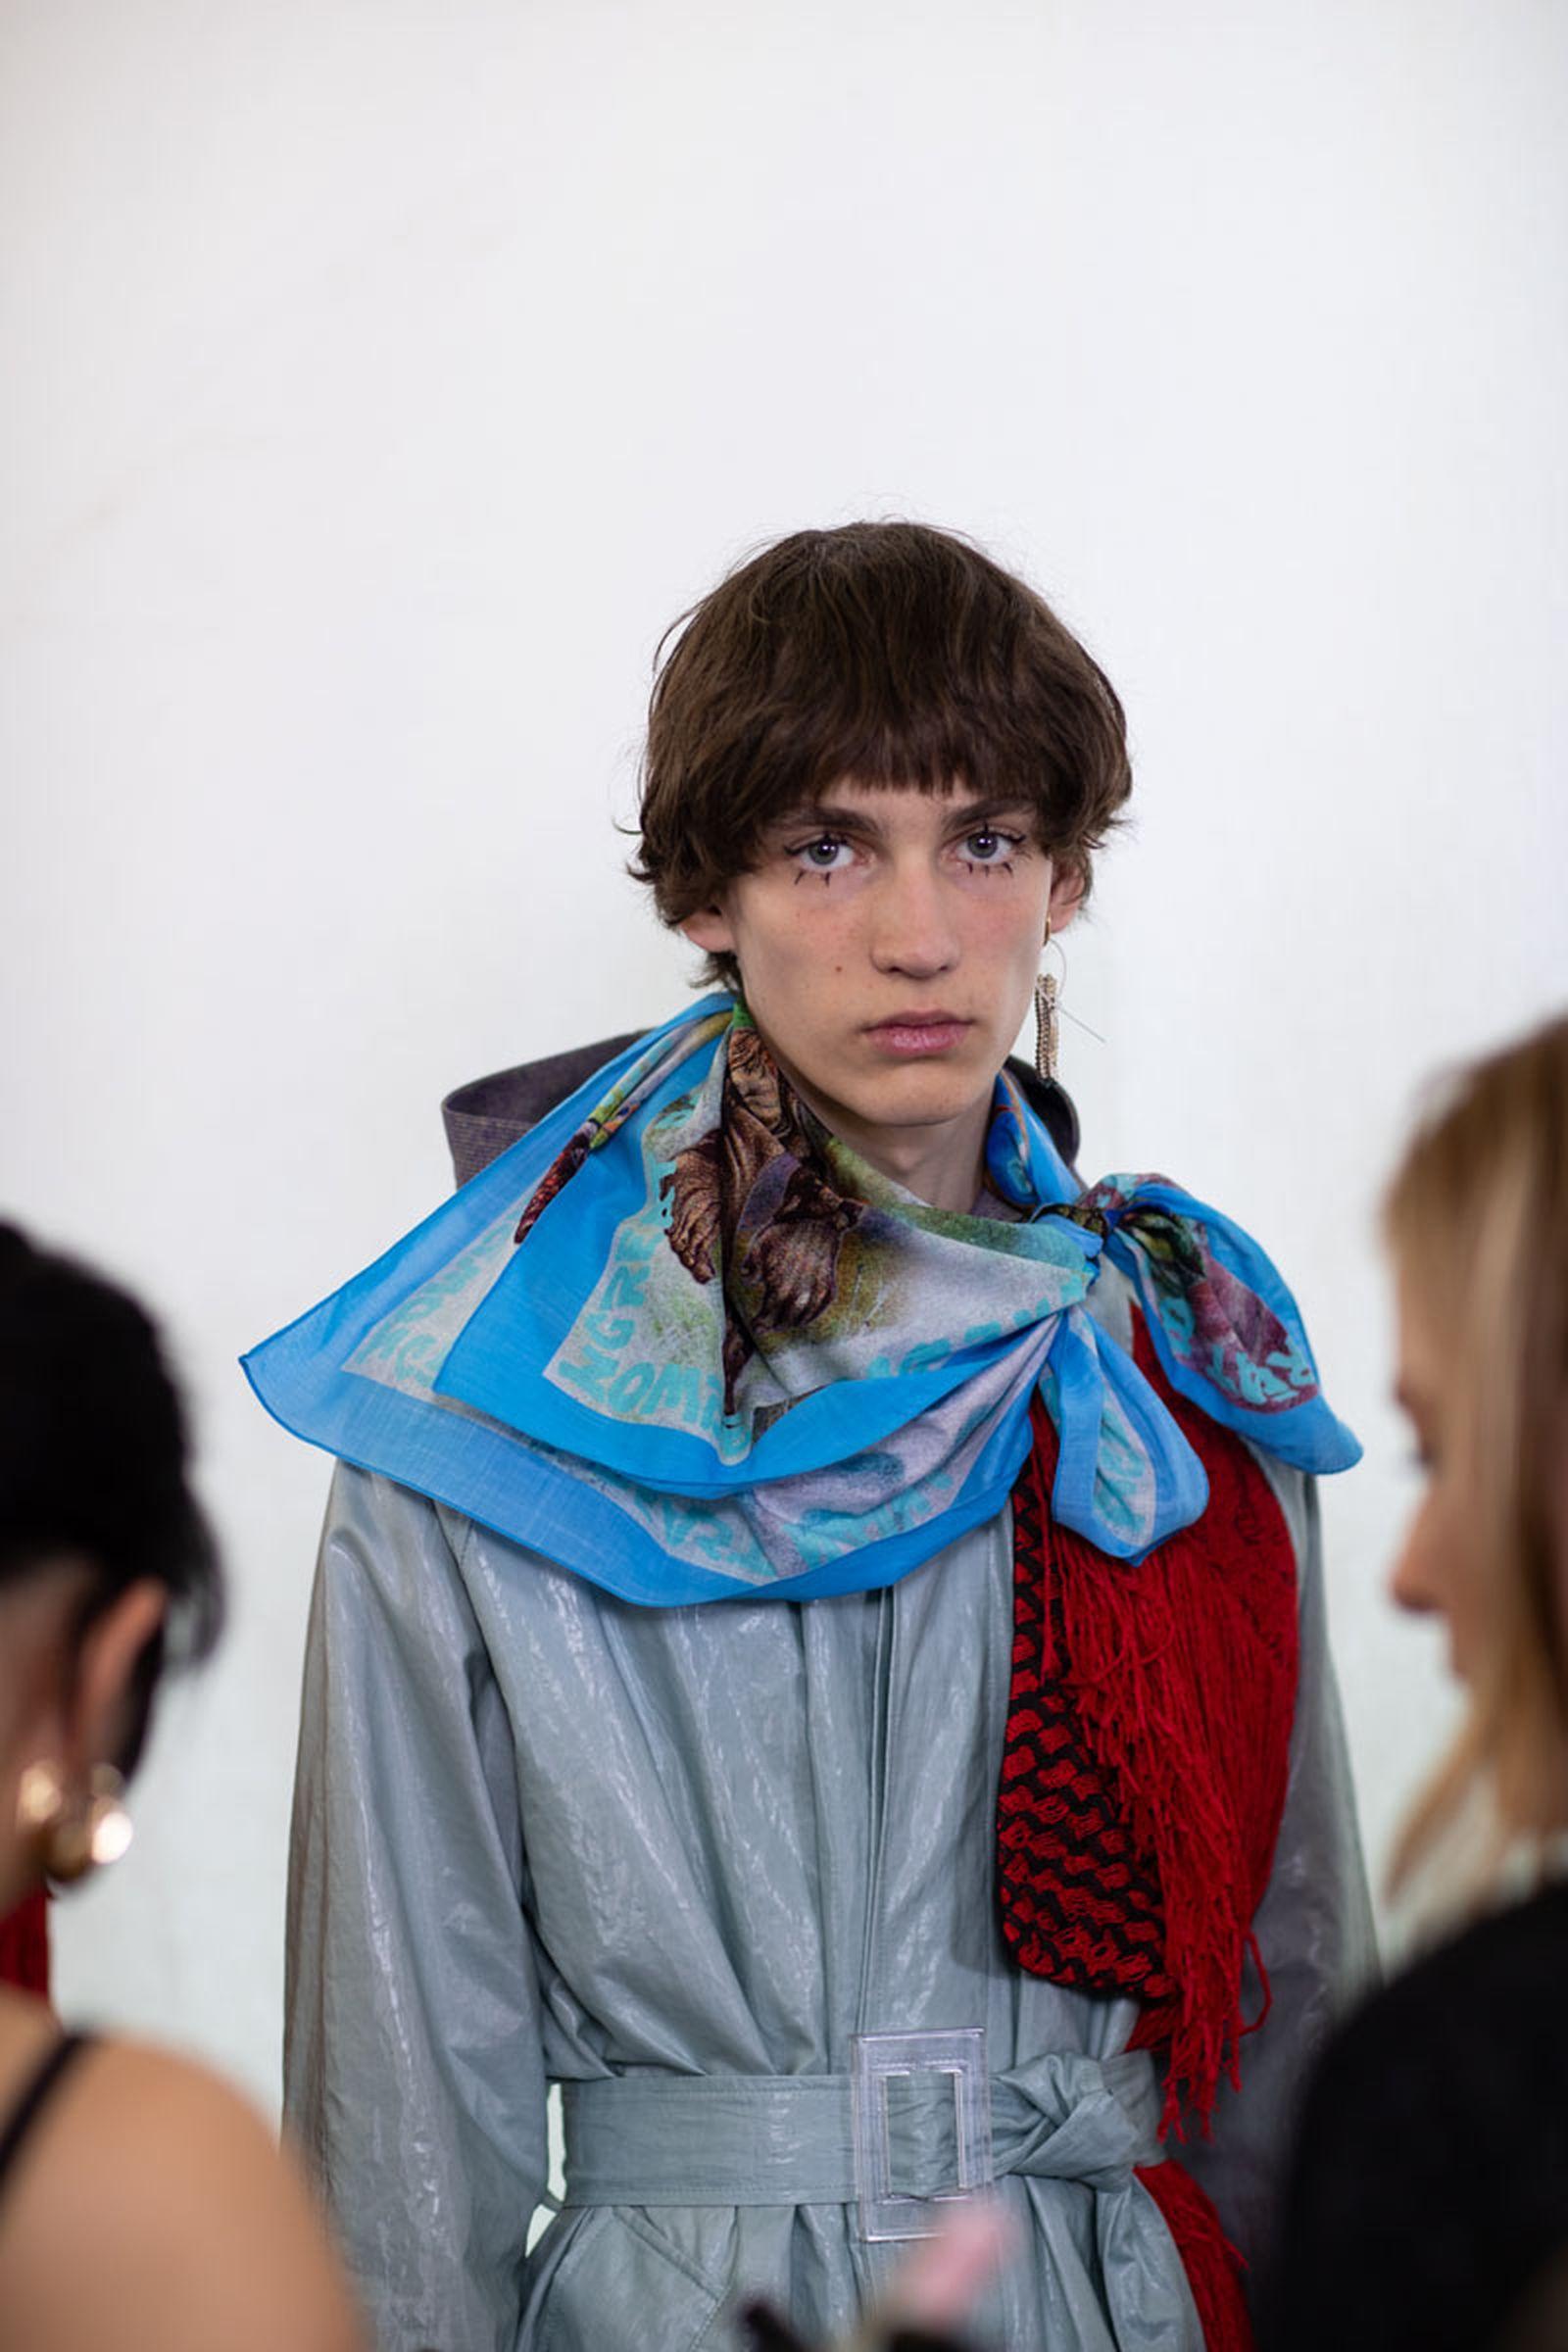 Paris AcneStudios EvaAlDesnudo ForWeb 04 Acne Studios paris fashion week runway